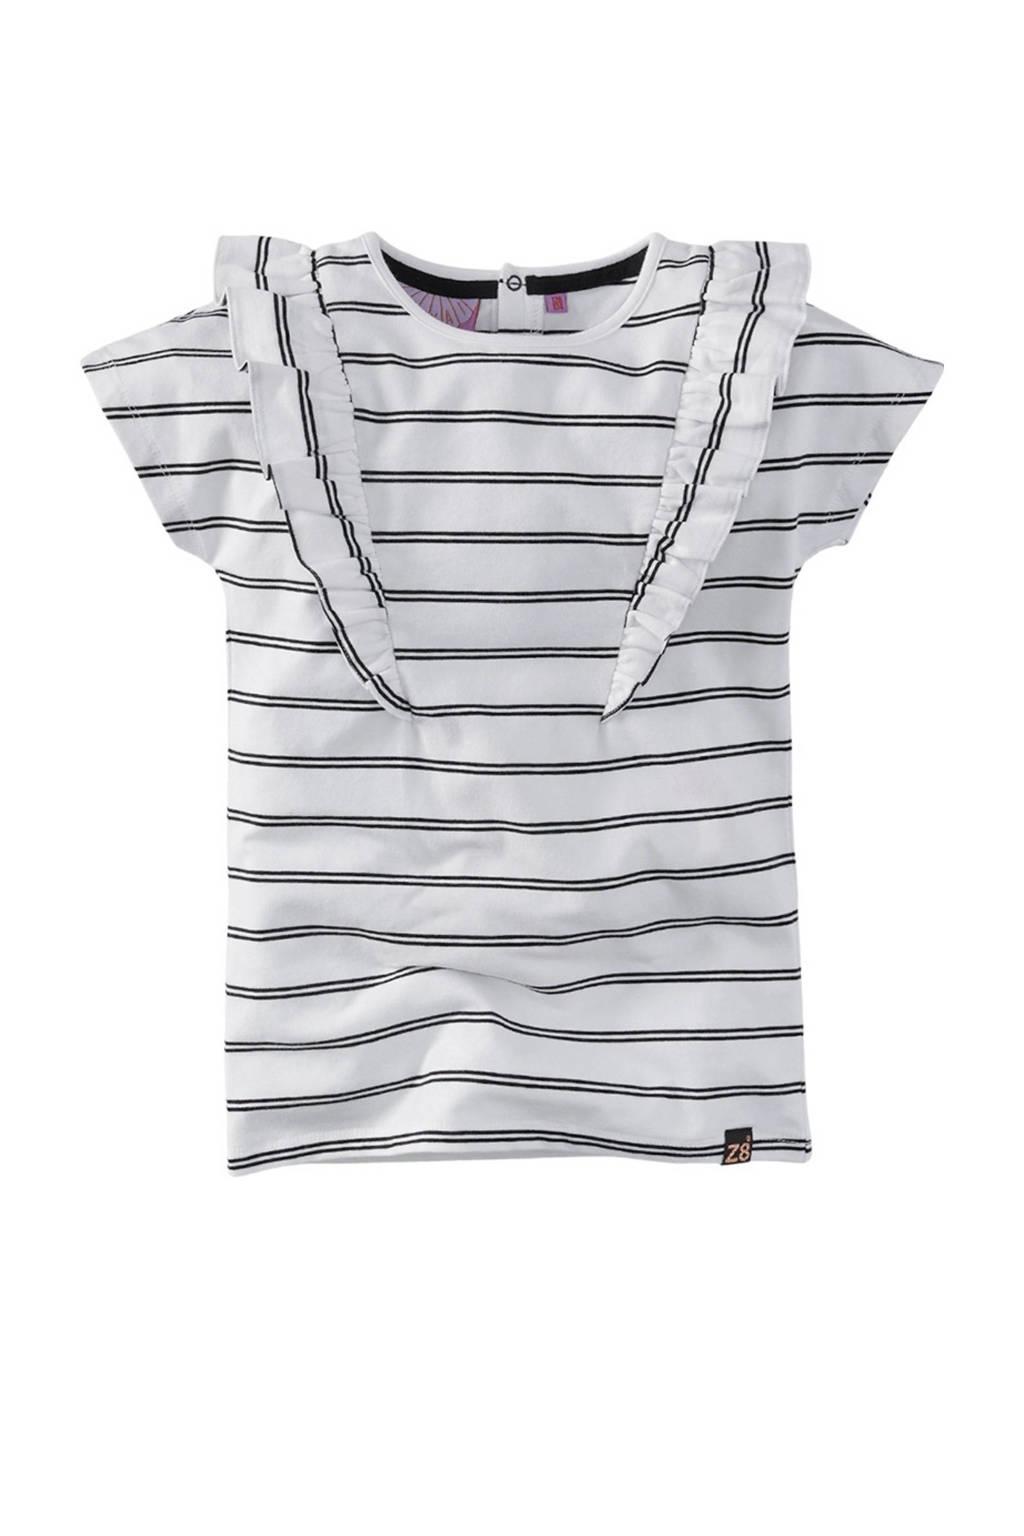 Z8 gestreept T-shirt Wisanne wit/zwart, Wit/zwart